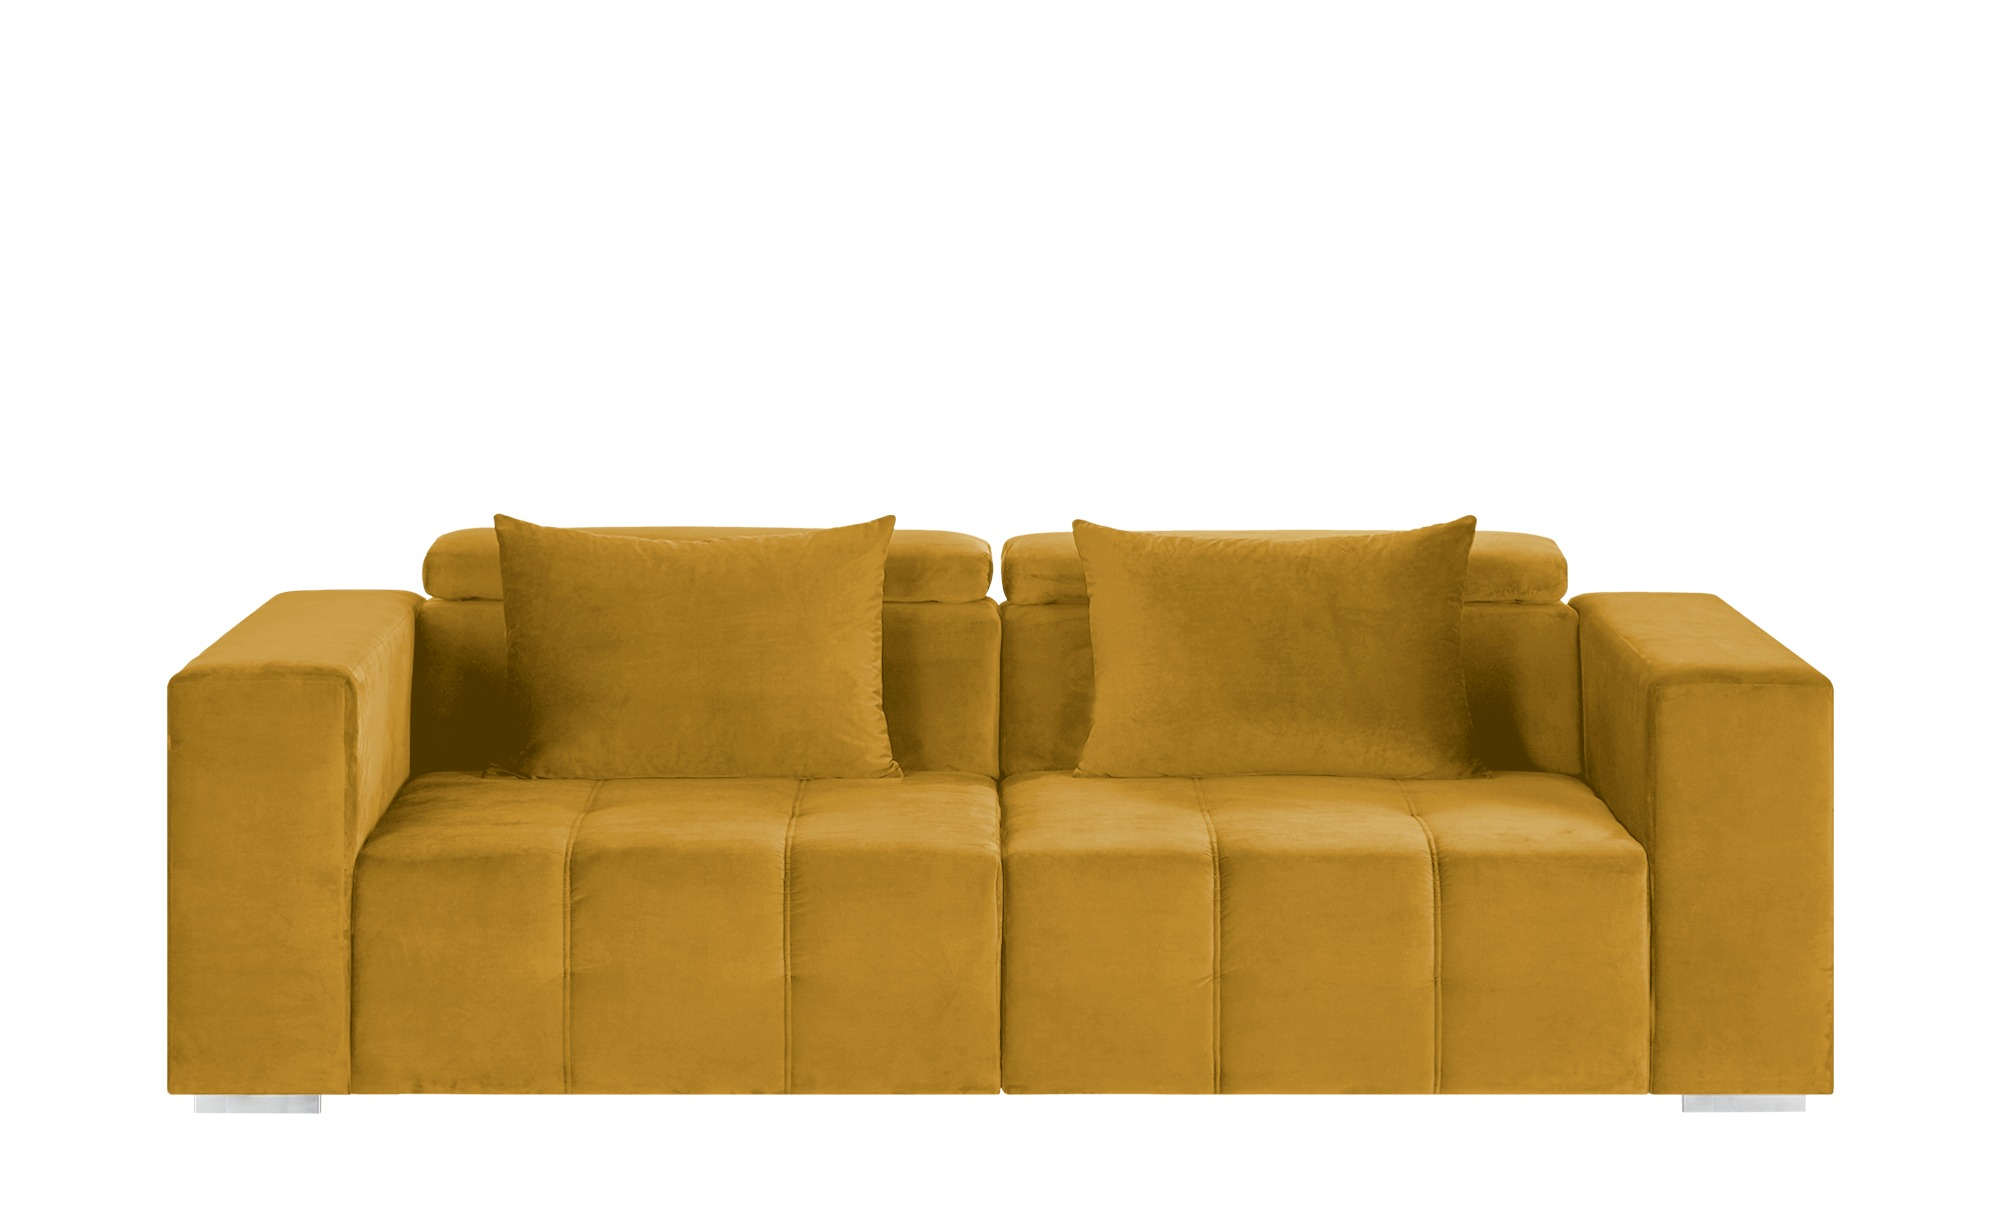 switch Big Sofa  Vila ¦ gold ¦ Maße (cm): B: 261 H: 79 T: 120 Polstermöbel > Sofas > Big-Sofas - Höffner